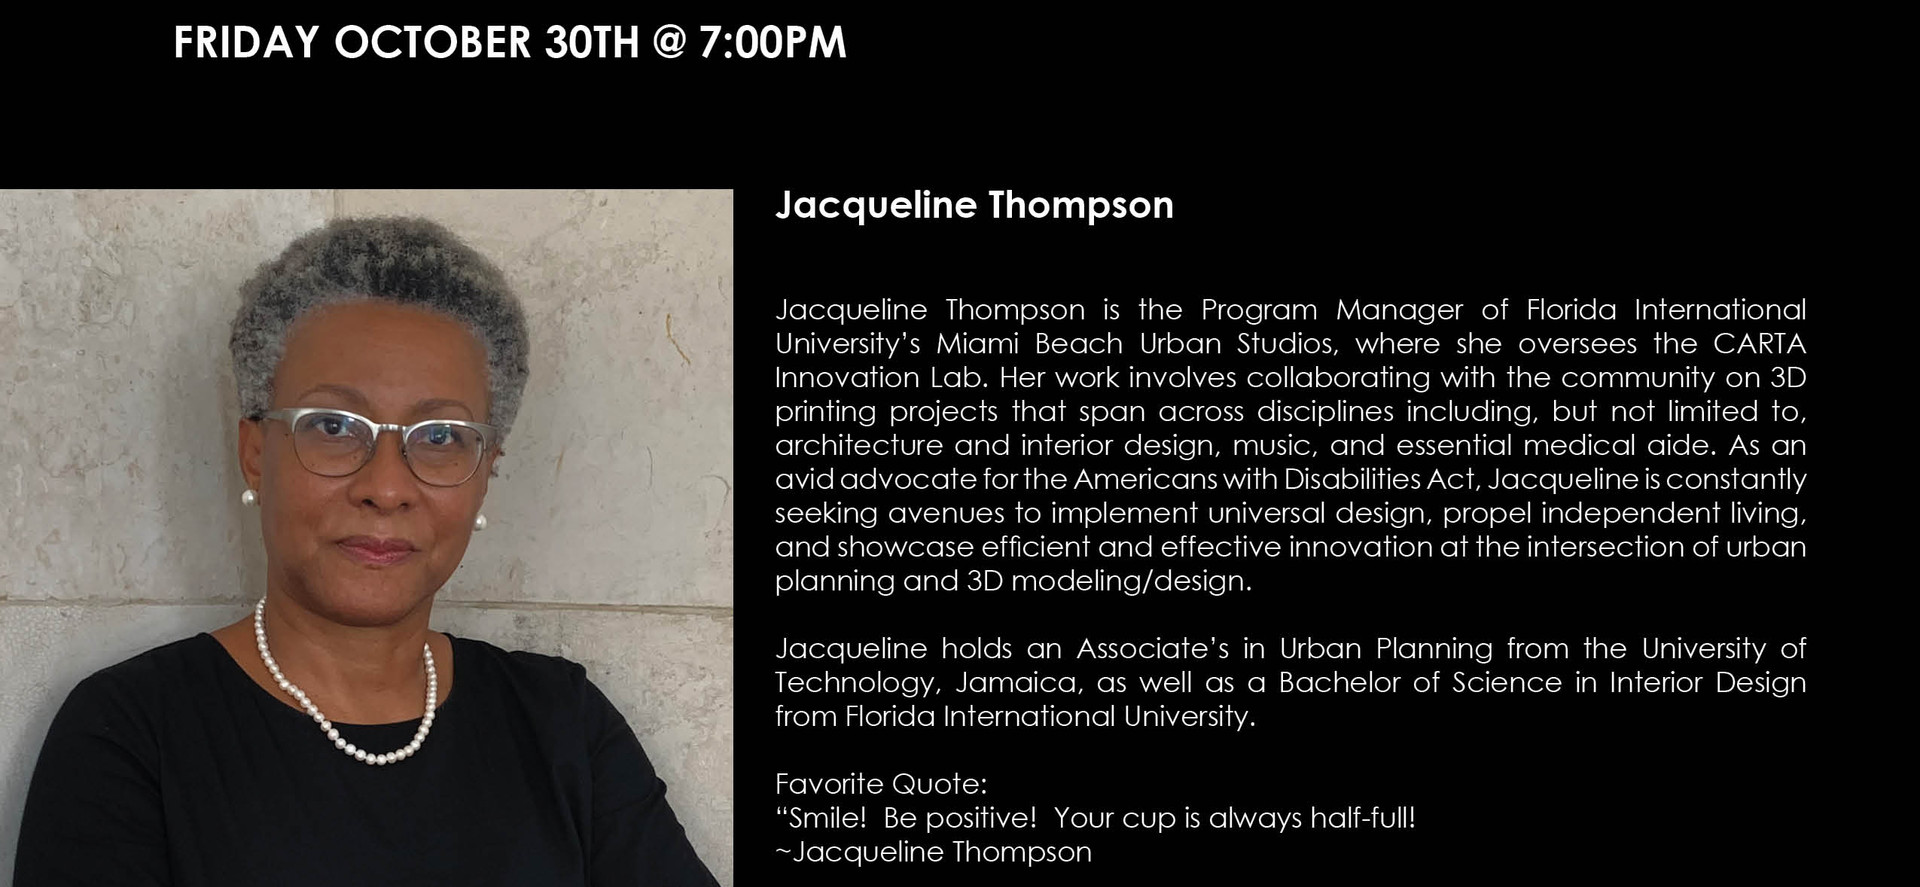 Jacqueline Thompson